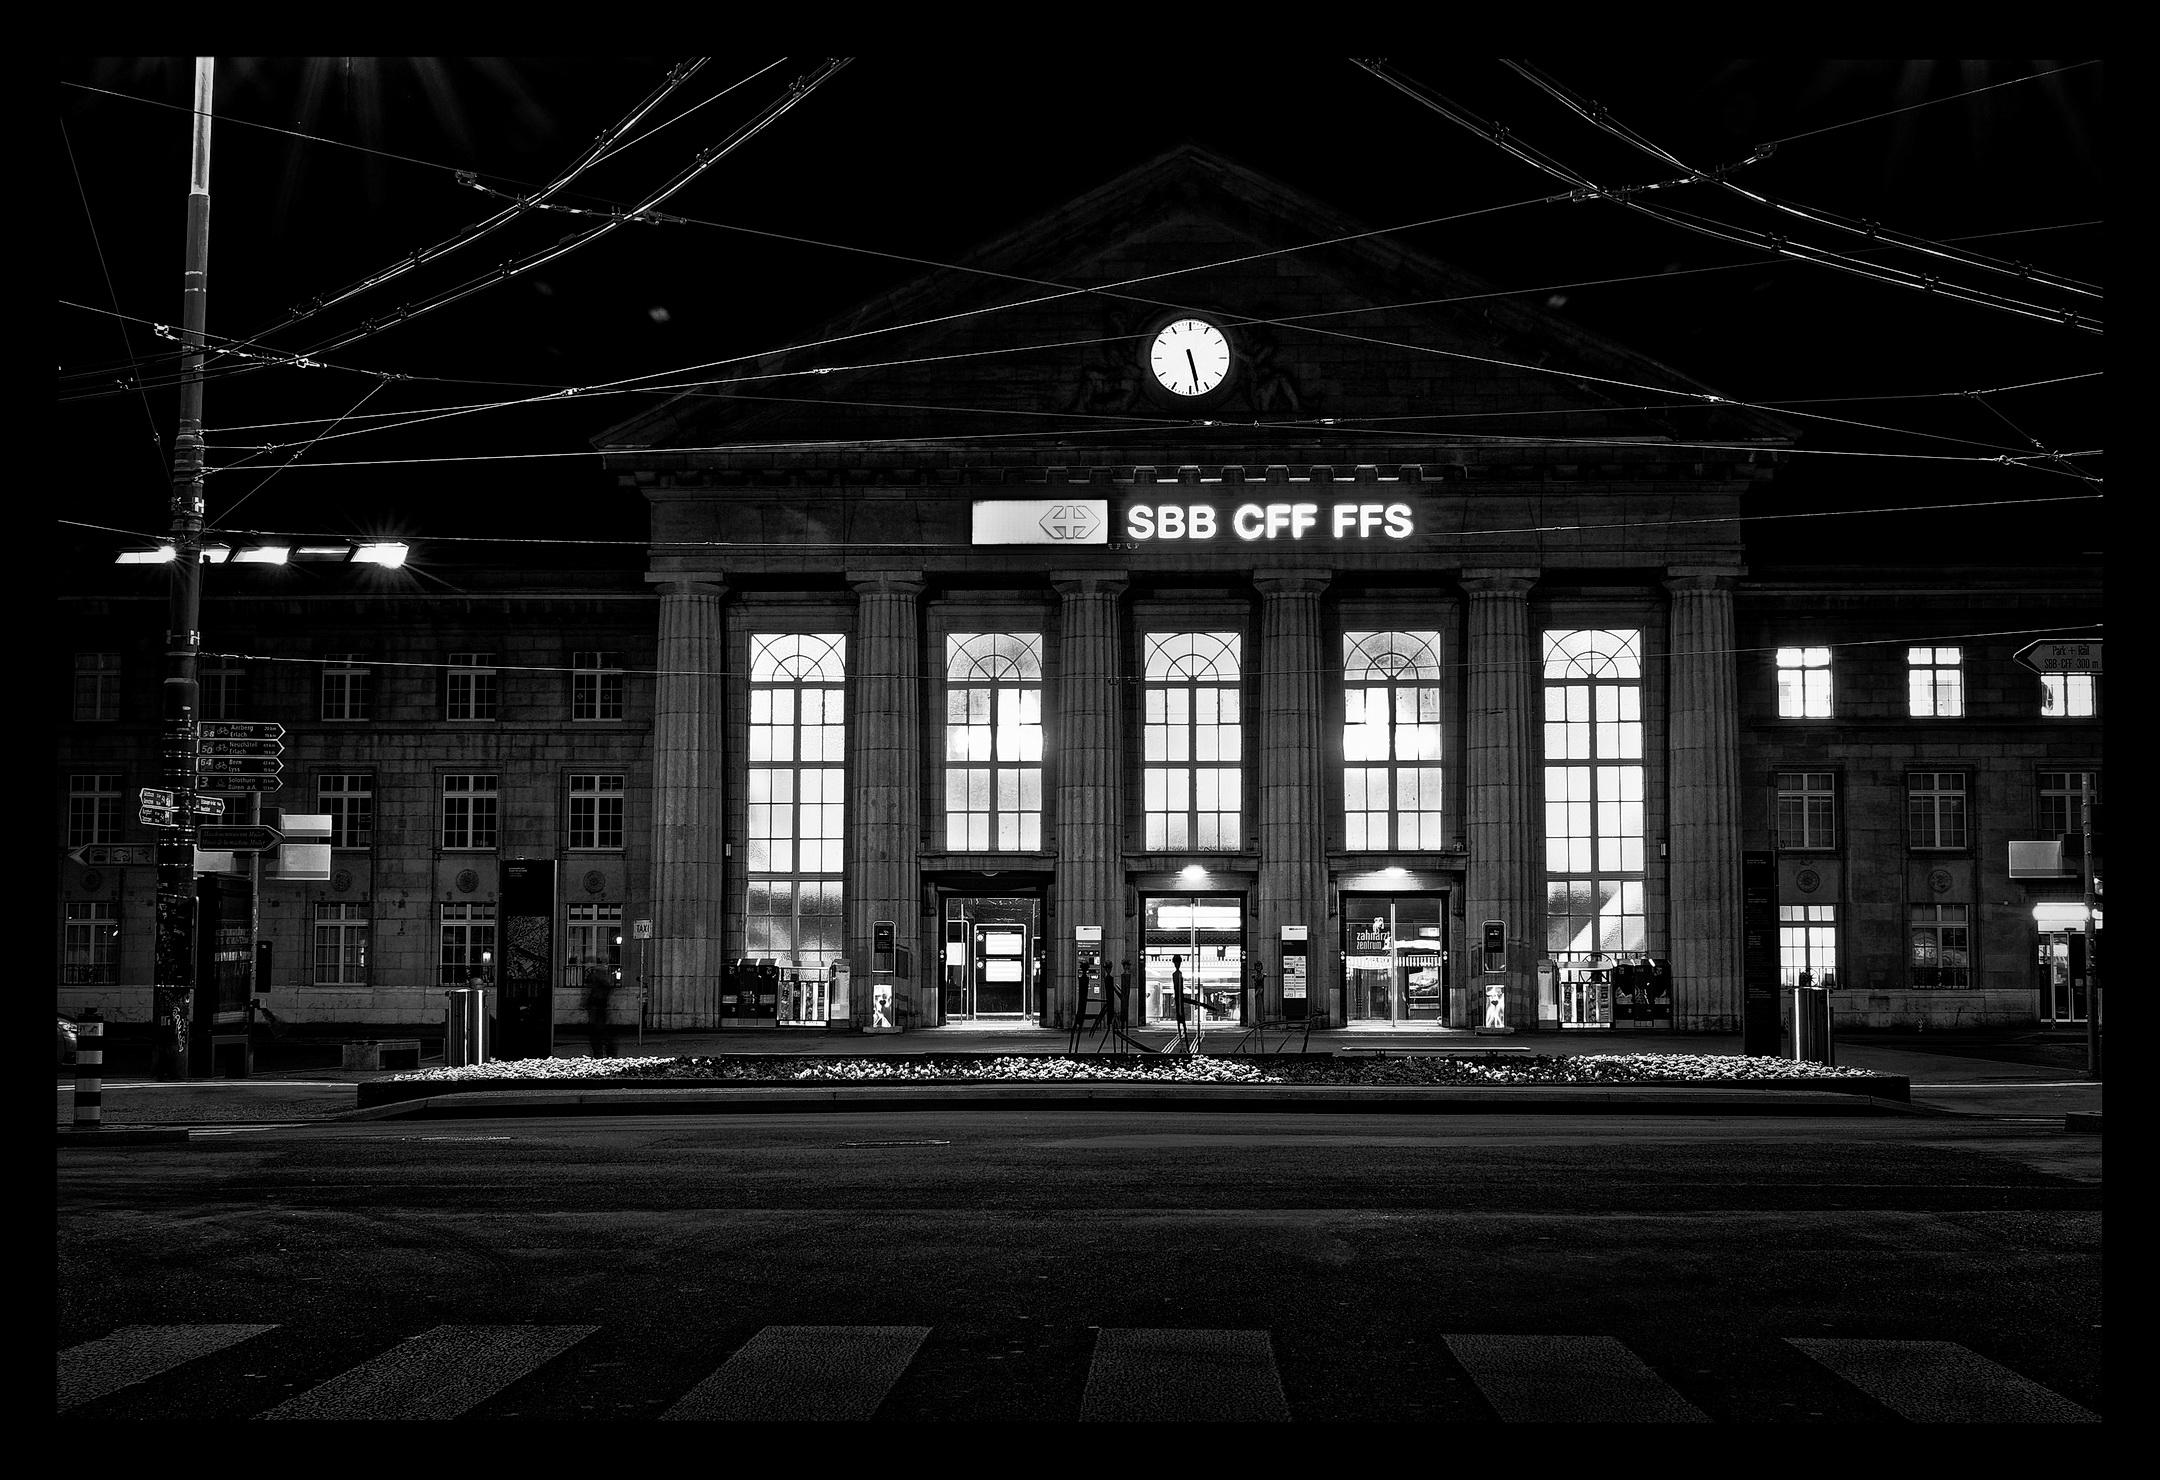 Bahnhof Biel am Morgen